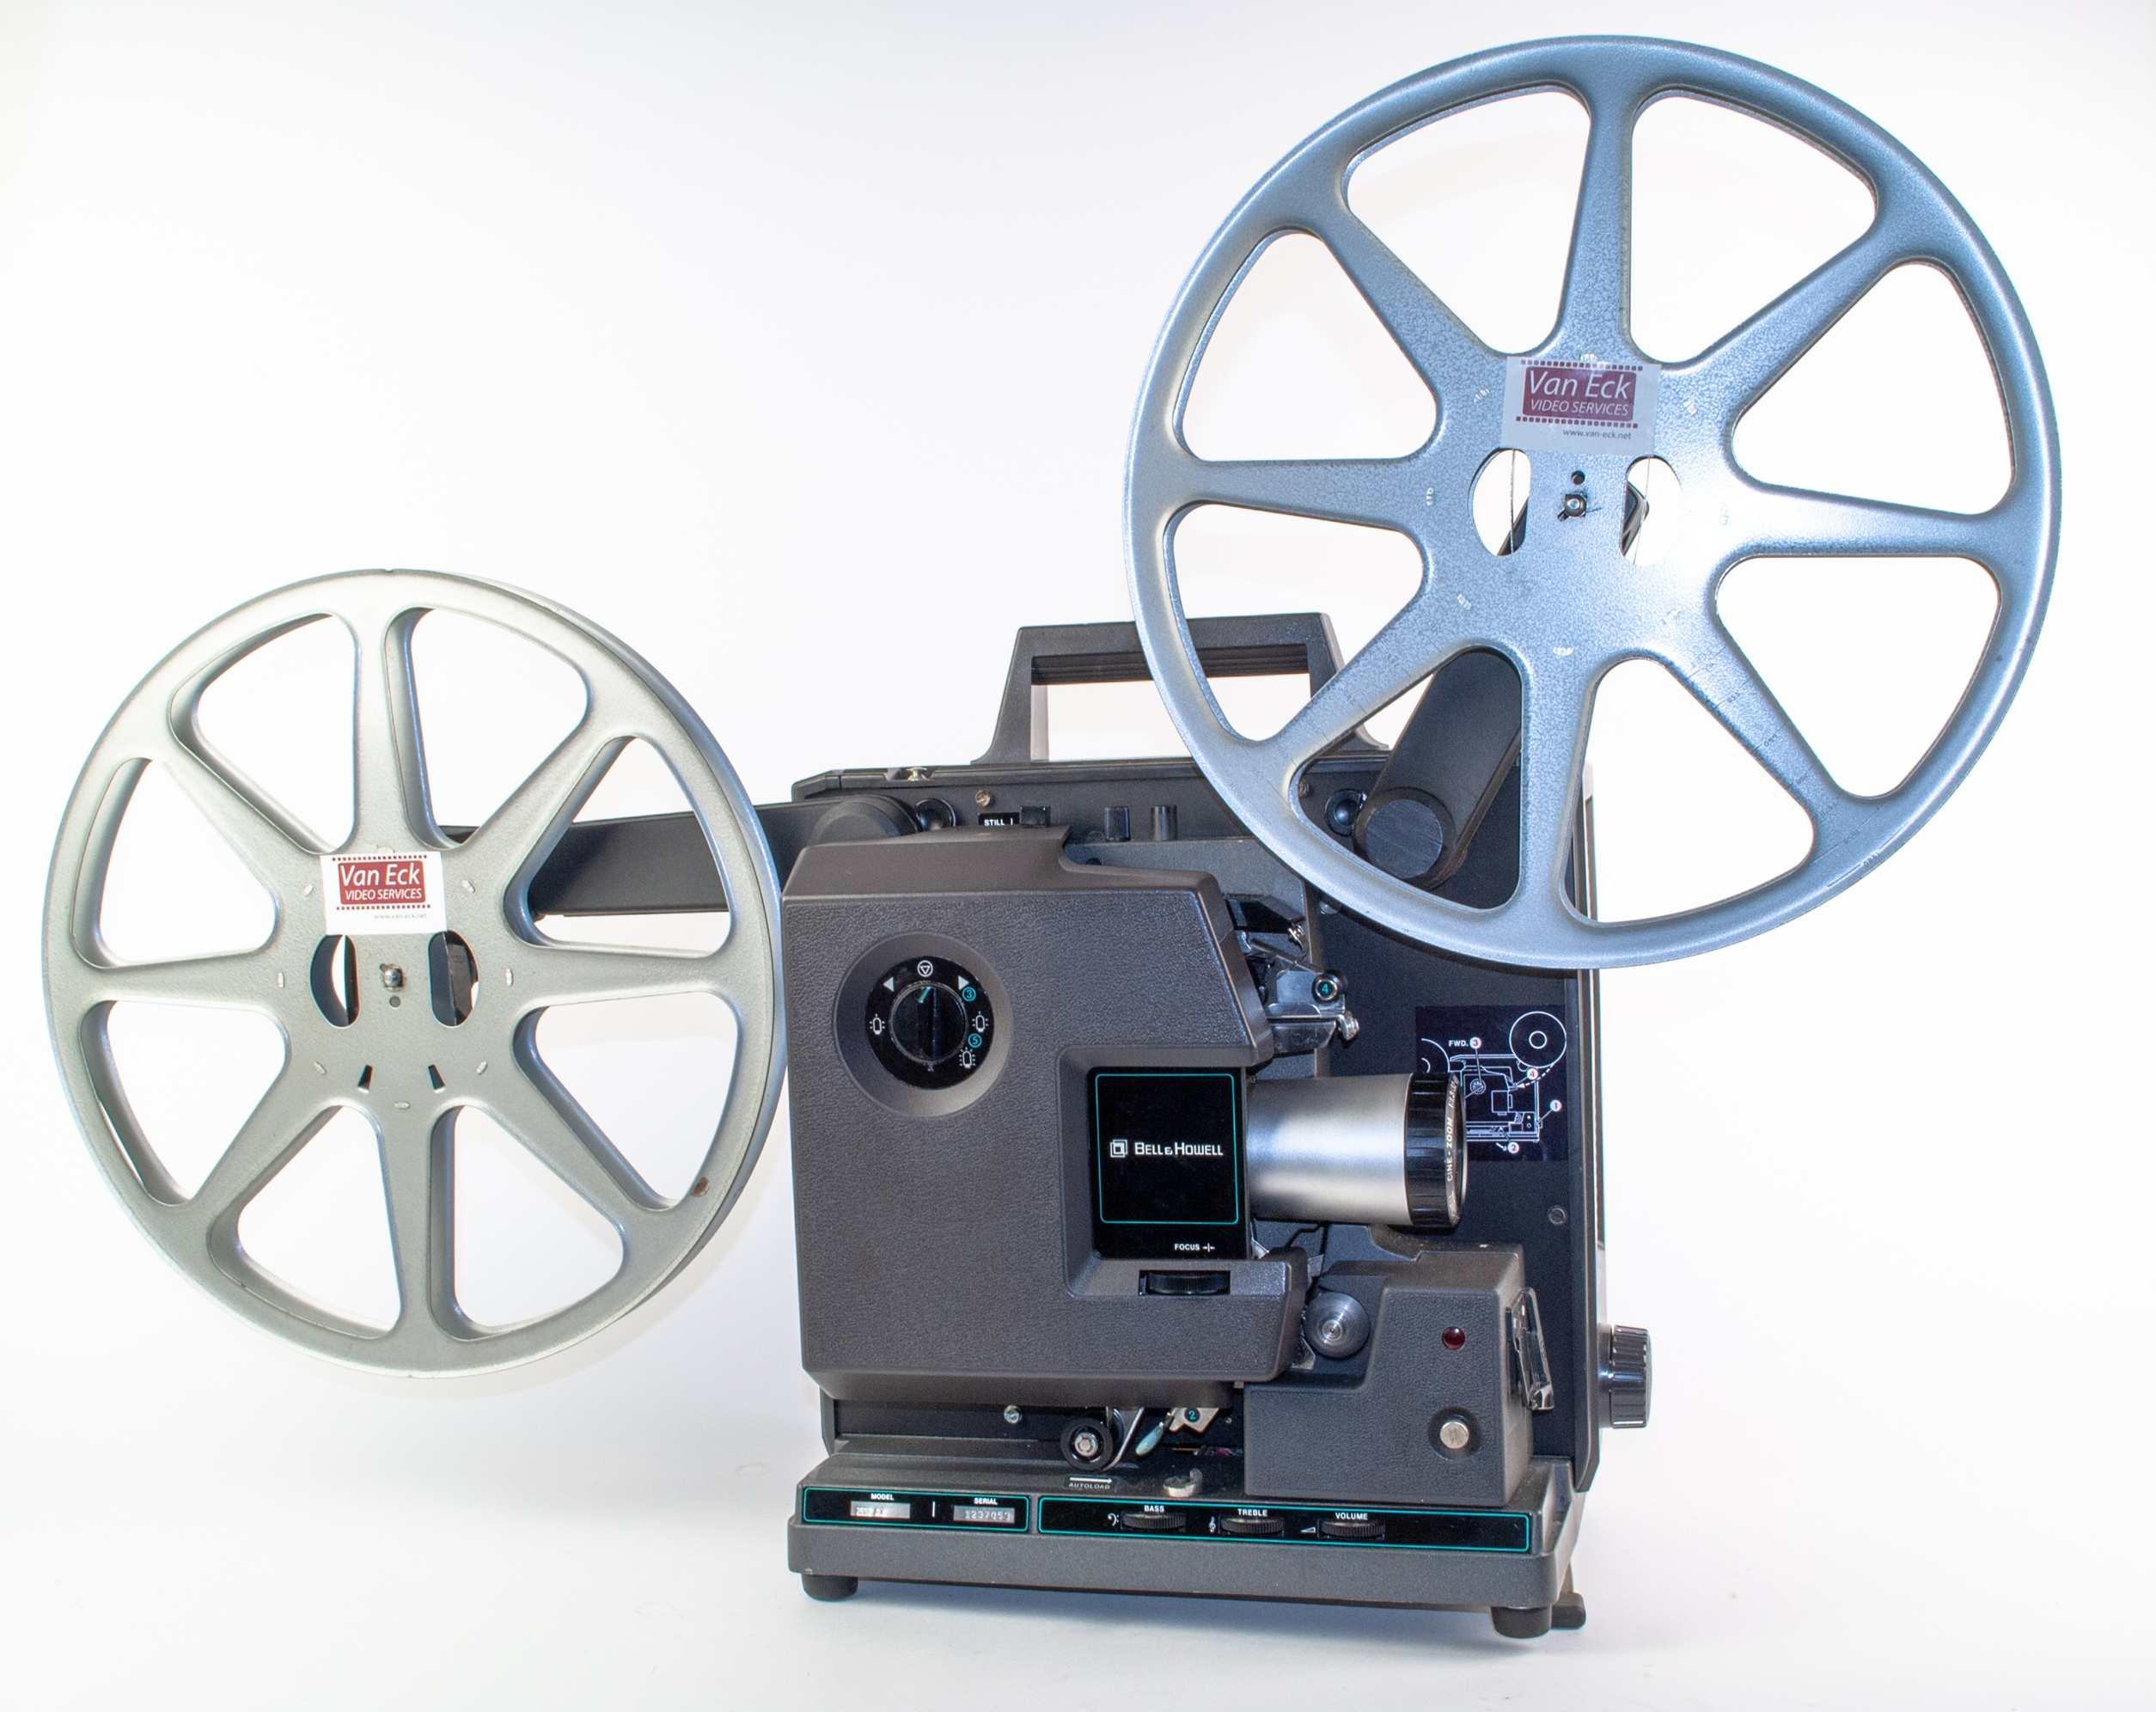 Filmosound Model 2592